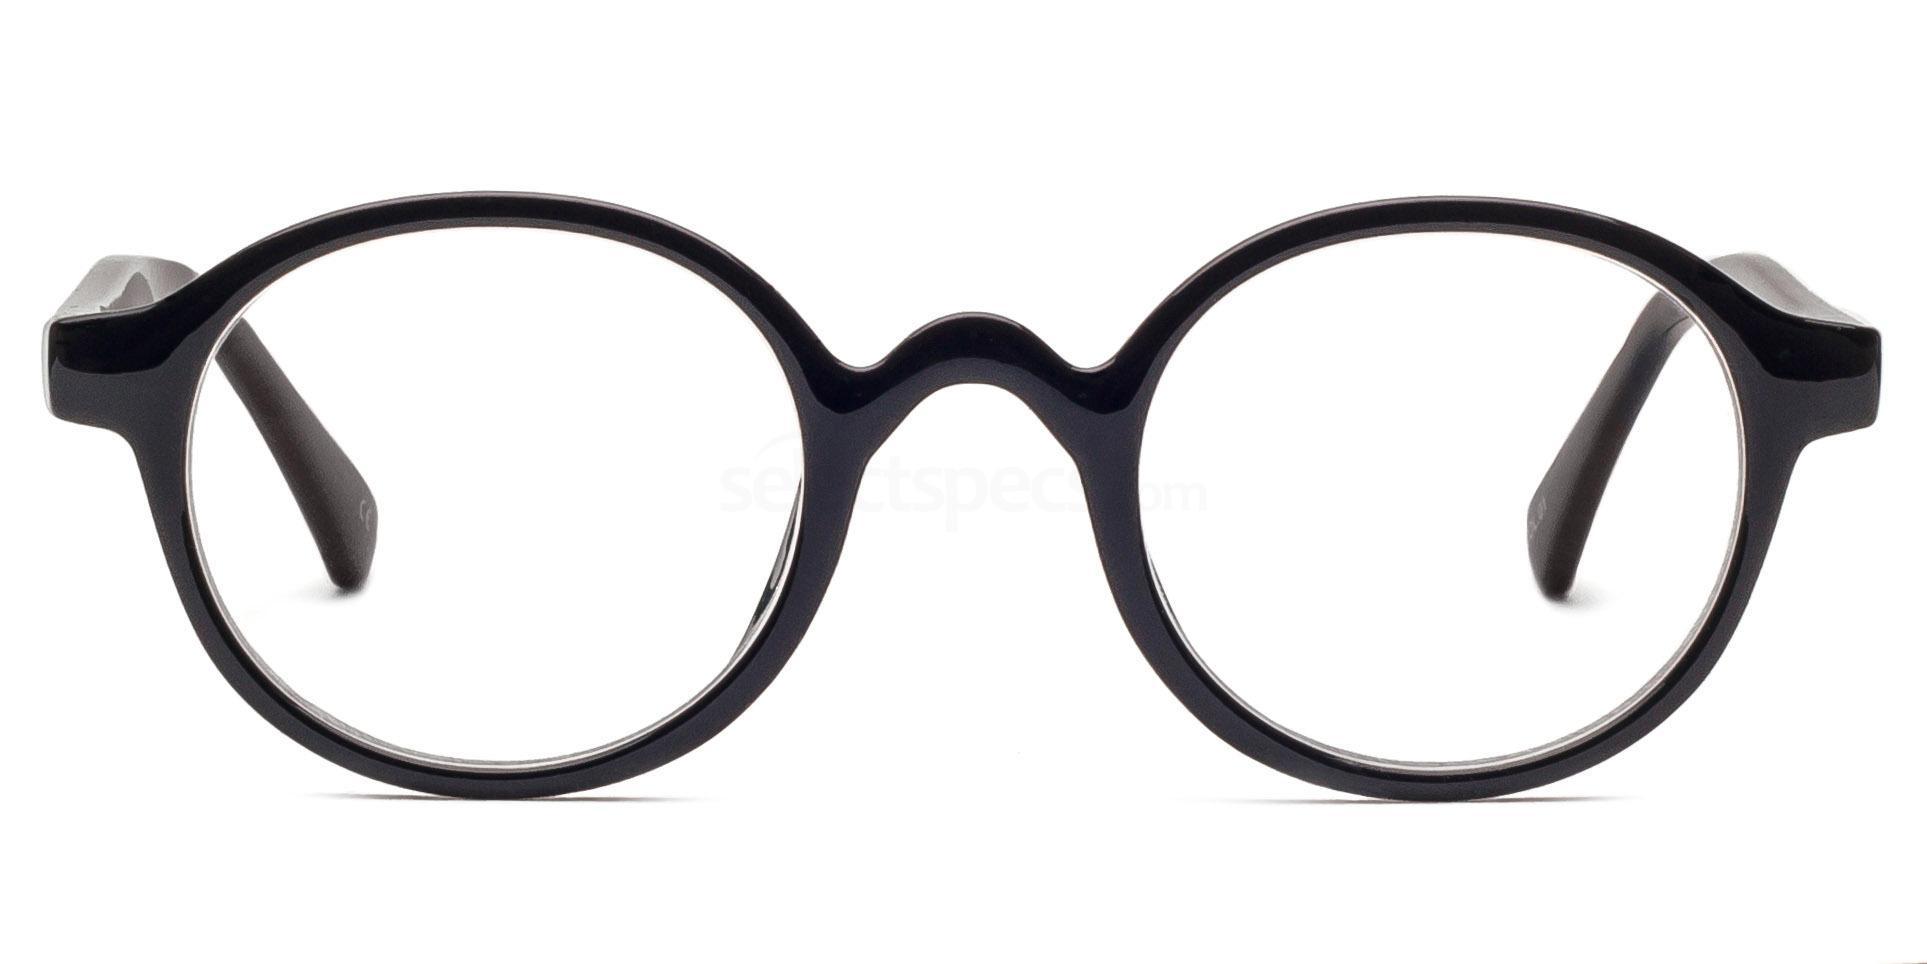 harry potter glasses prescription